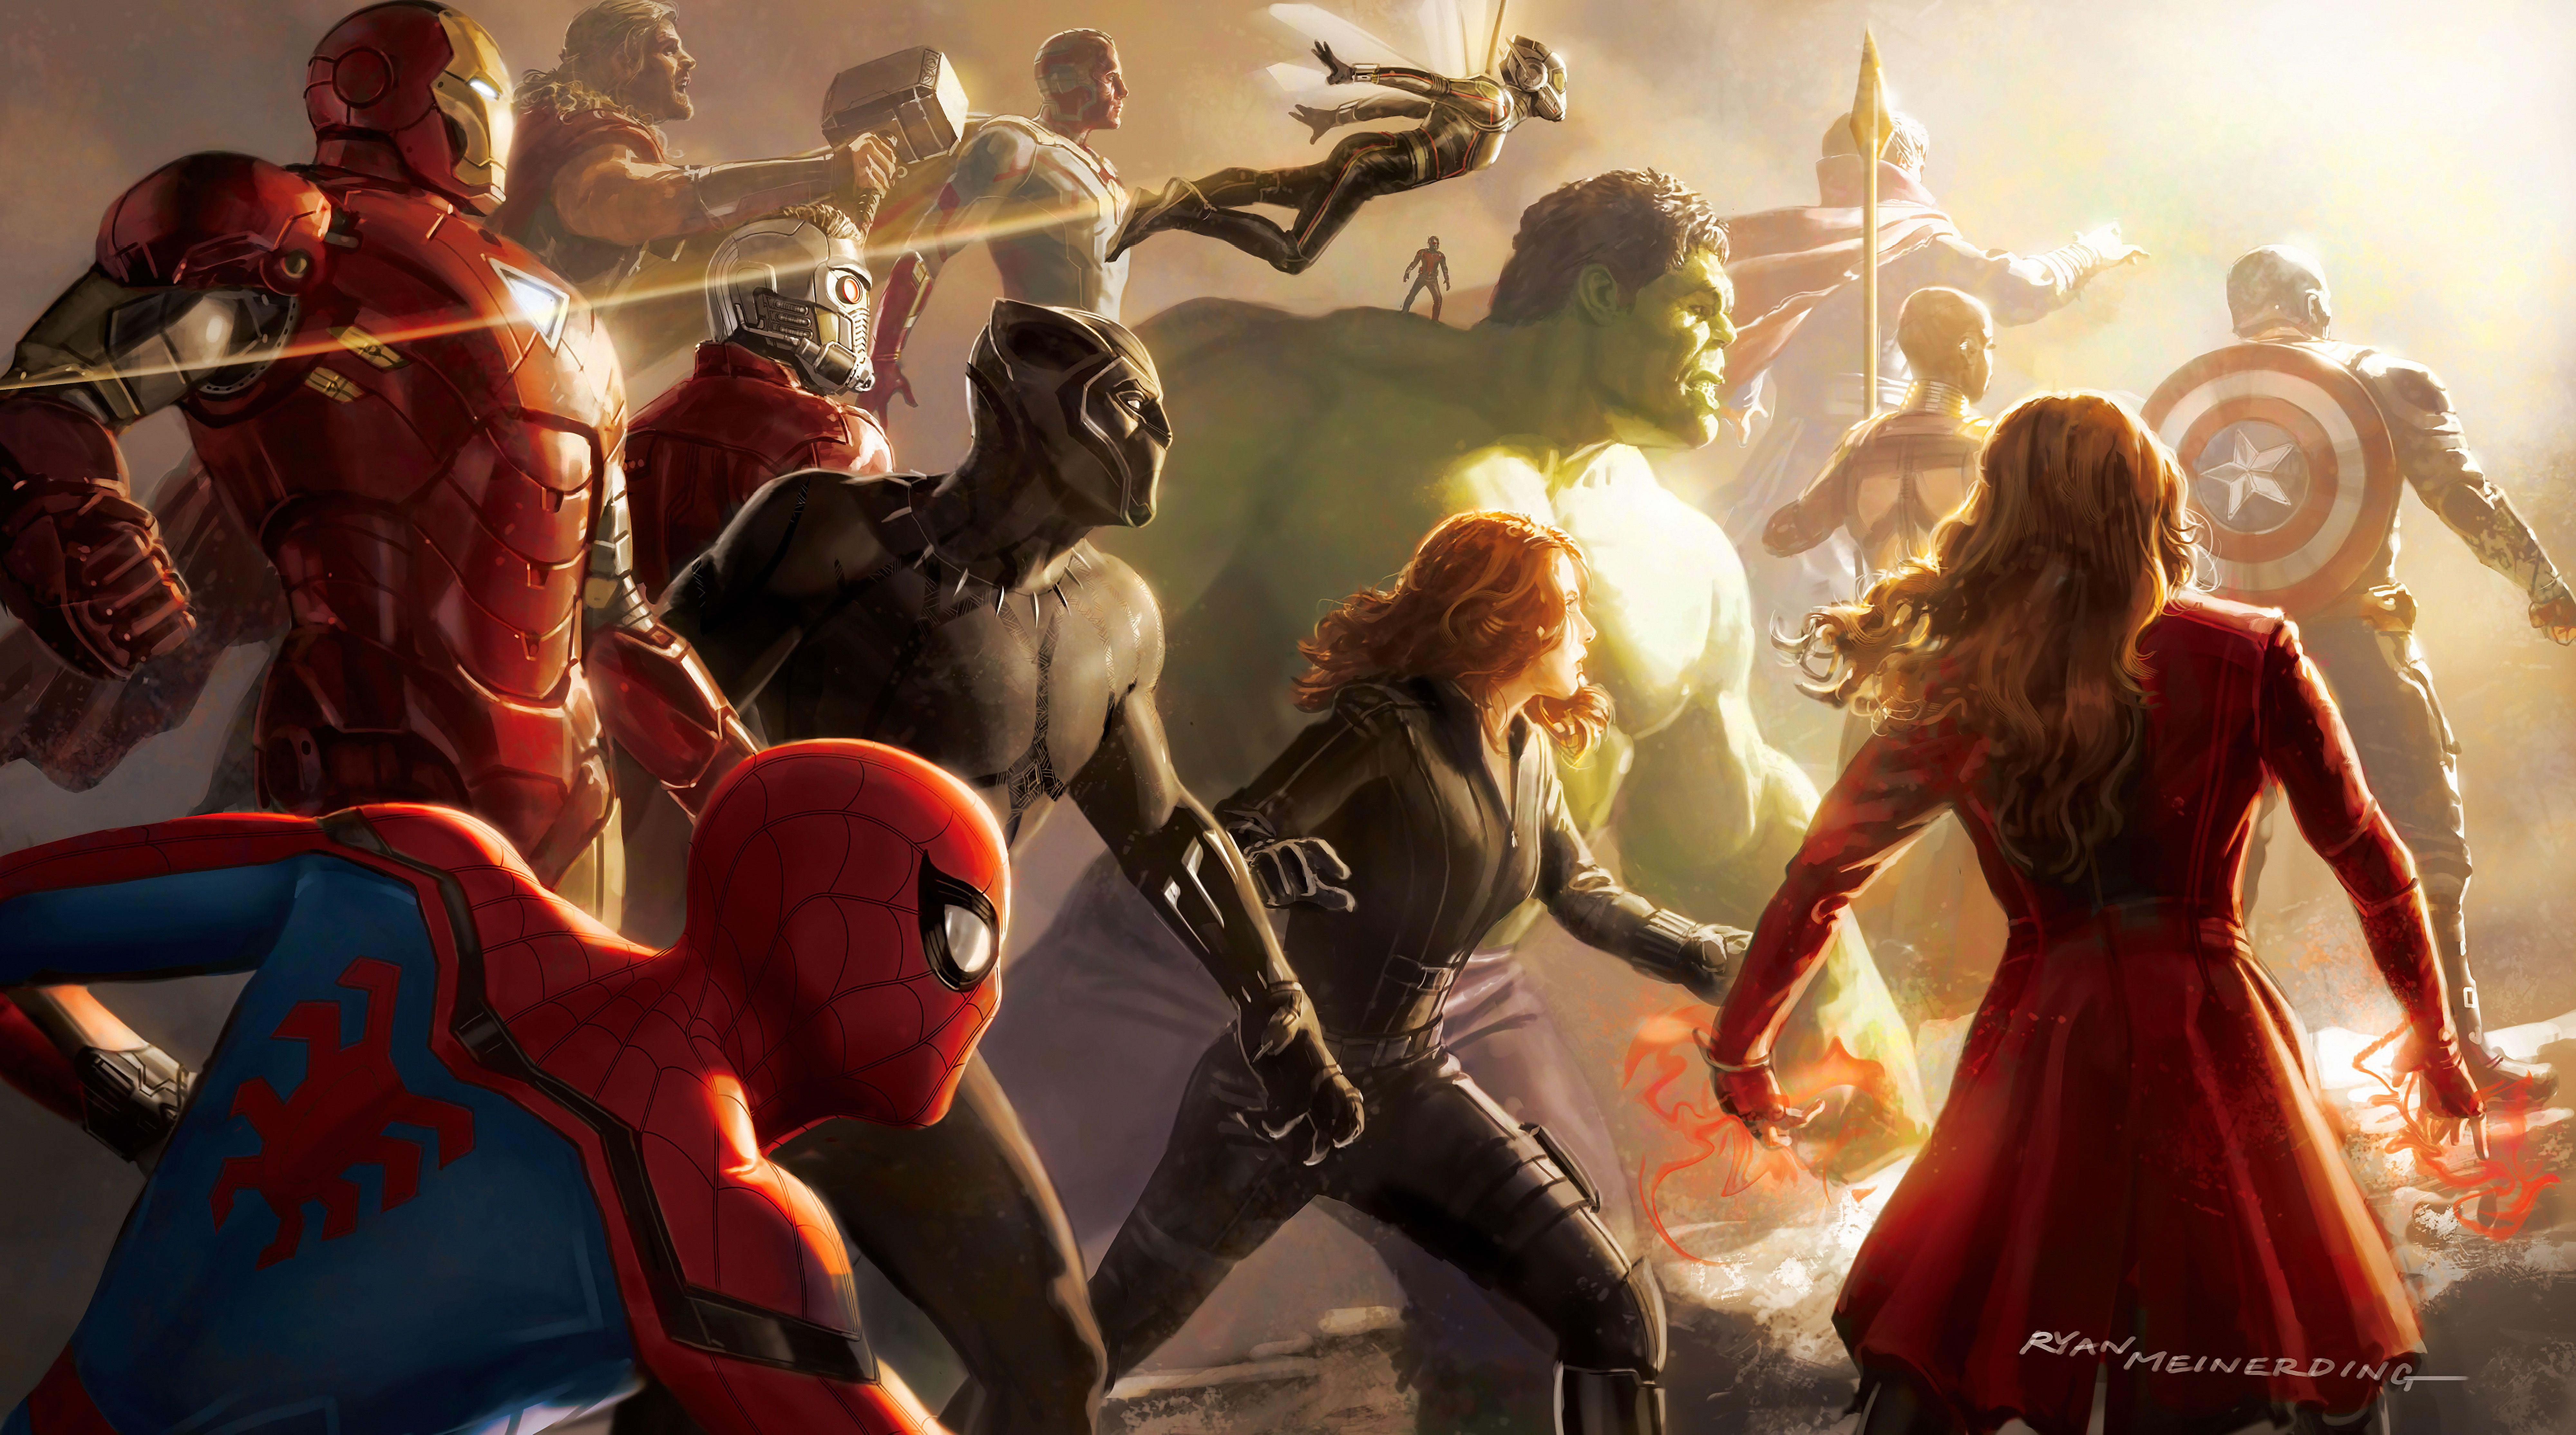 Avengers Desktop 4k Wallpapers - Wallpaper Cave